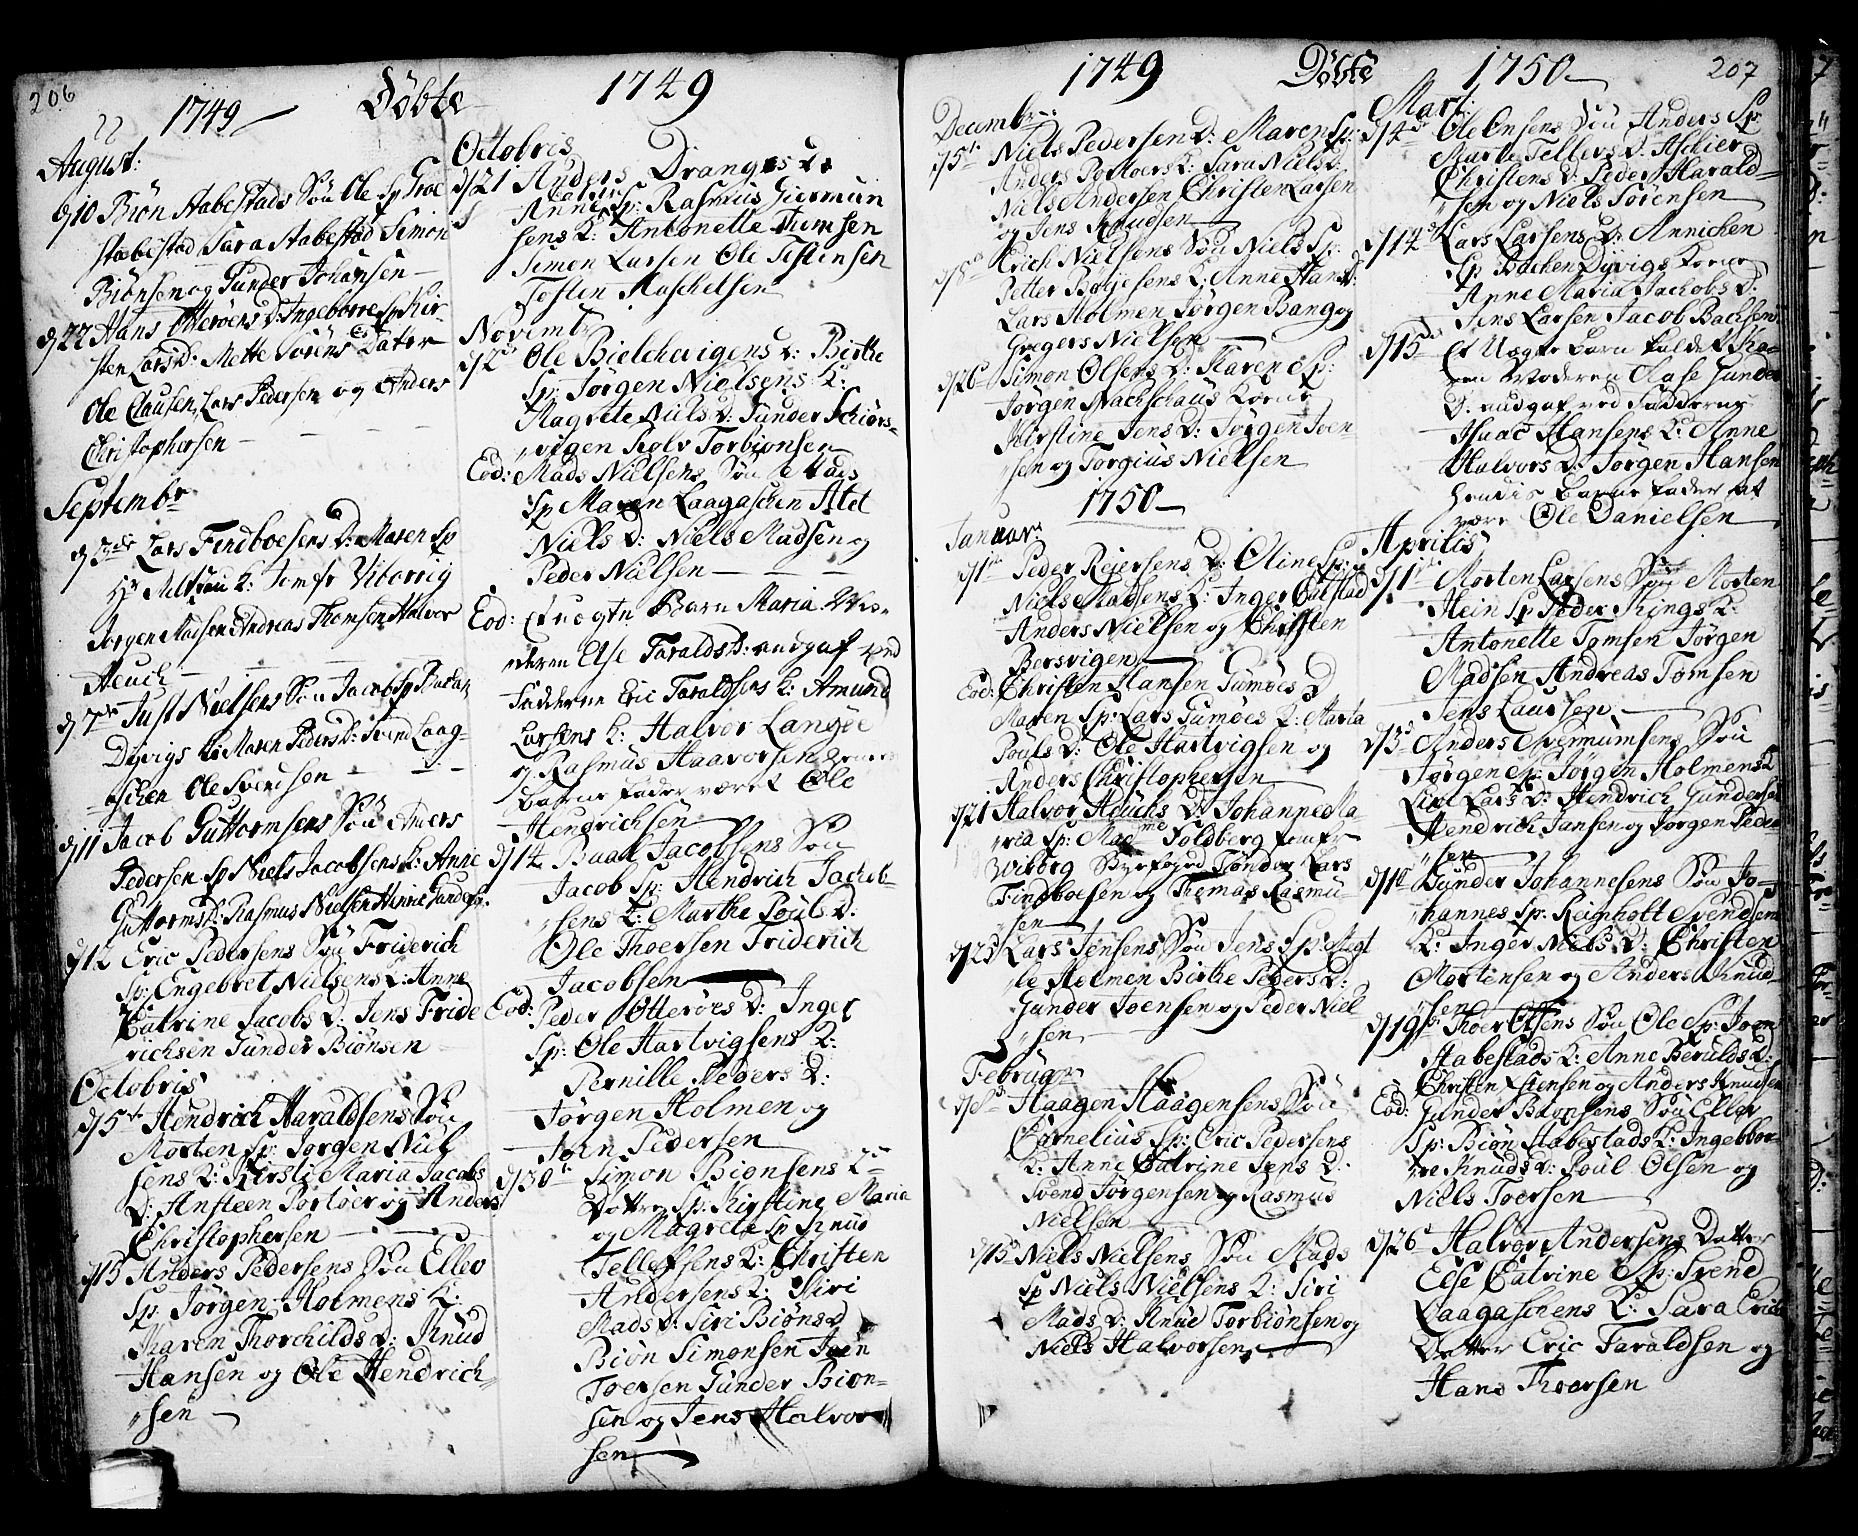 SAKO, Kragerø kirkebøker, F/Fa/L0001: Ministerialbok nr. 1, 1702-1766, s. 206-207